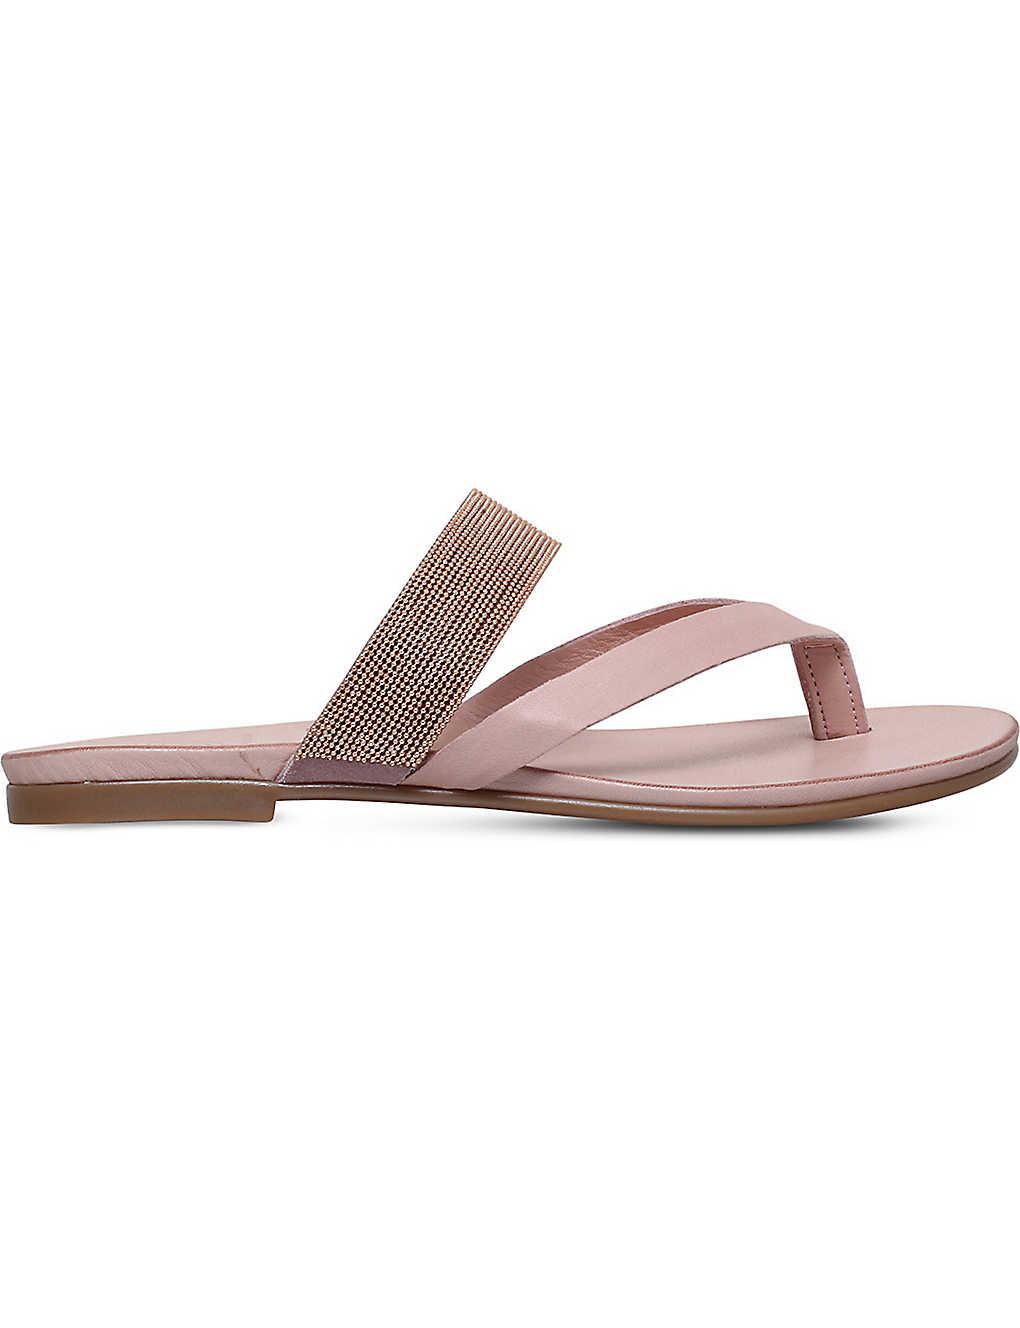 1926d7dacef3b KG KURT GEIGER - Mae leather sandals